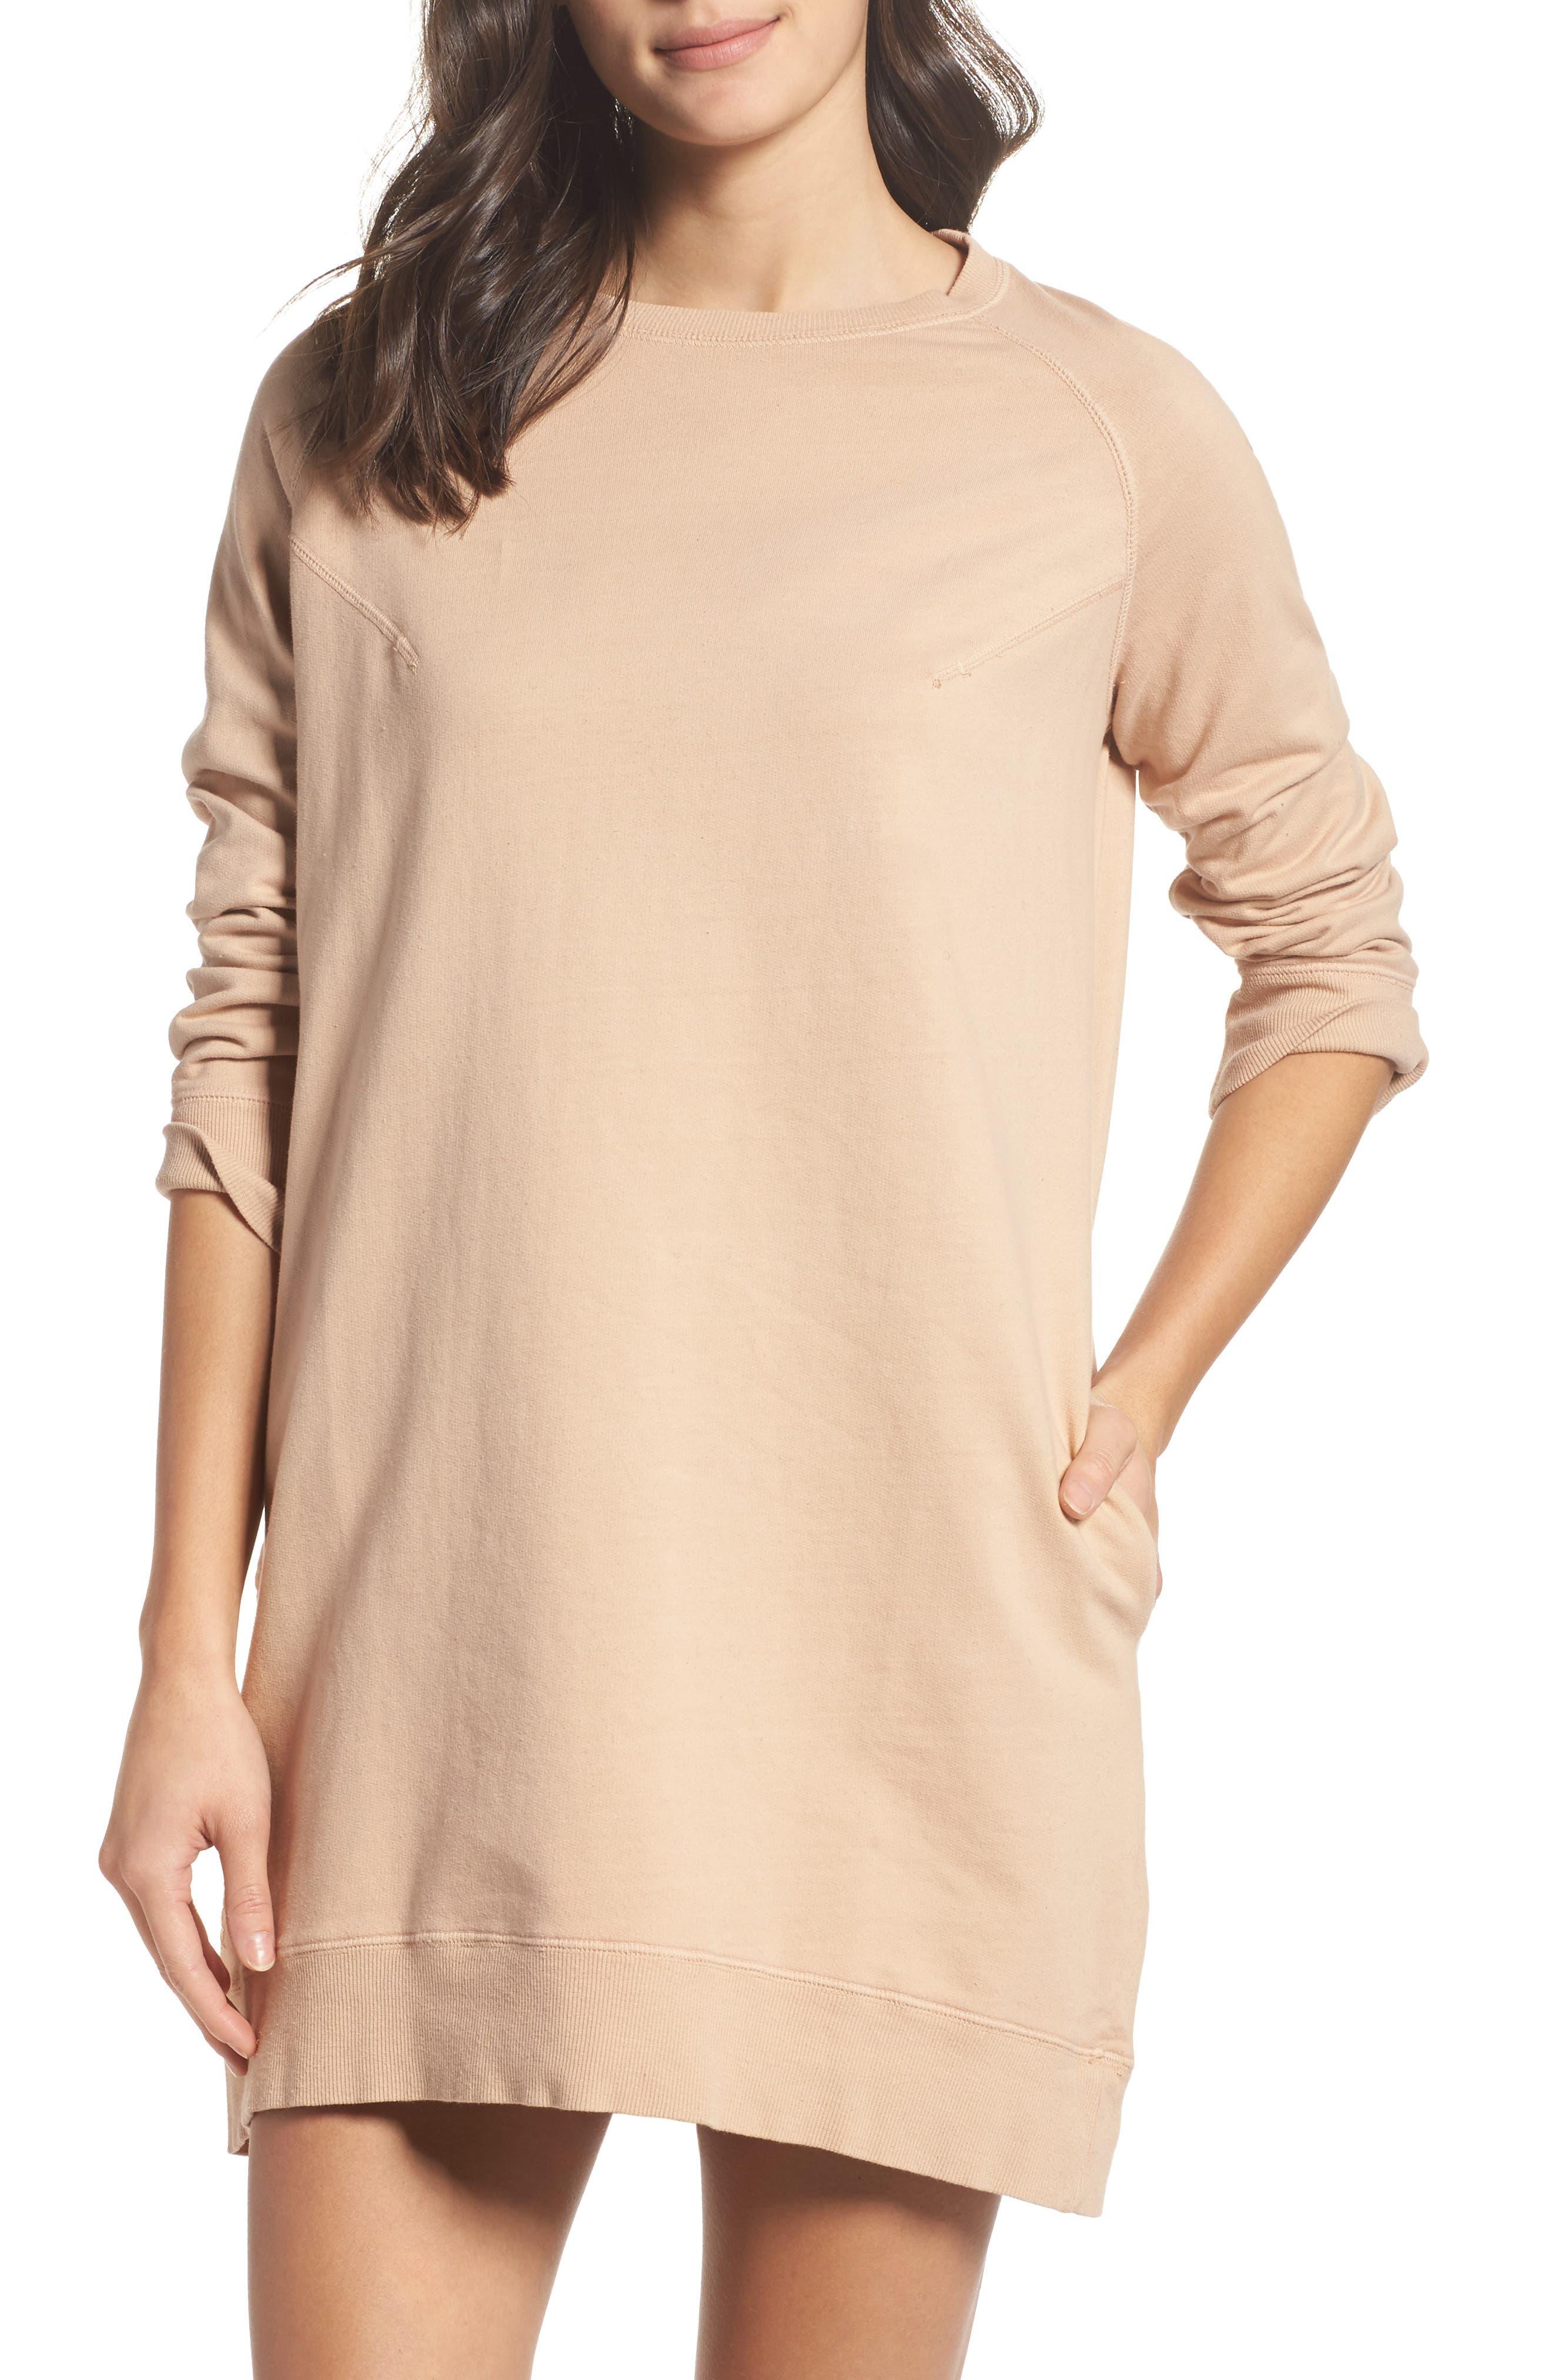 Sweatshirt Dress,                             Main thumbnail 1, color,                             950